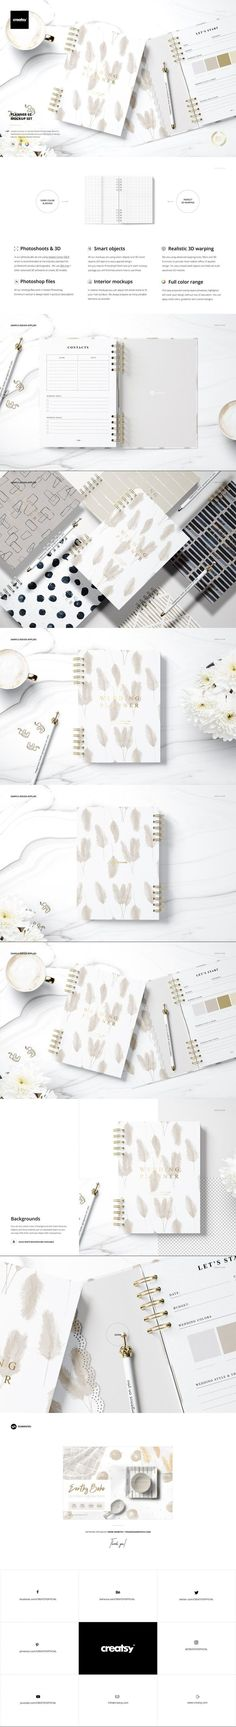 Planner Mockup Set 02 #wall #marketing #mockupdesign #graffiti #underground #templates #document #cool #psd #paris #pat #typography #pattern #MockupTemplates #postermockup #binder #print #branding #mockup Planner Template, Mockup, Color Change, Pat Pat, Paper Logo, Custom Design, Creations, Poster Templates, Letterhead